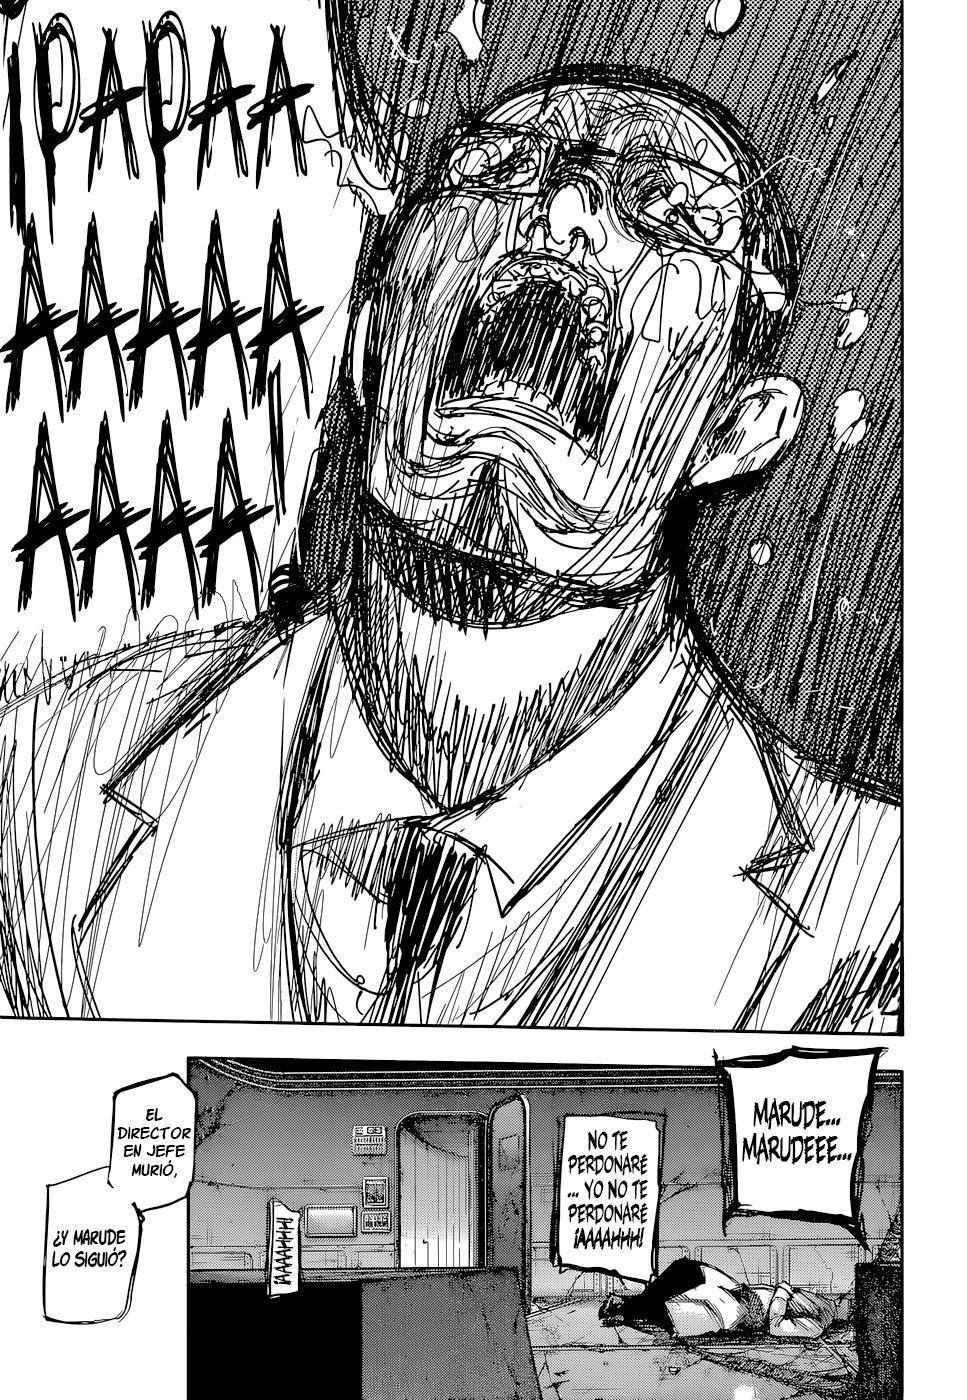 http://c5.ninemanga.com/es_manga/59/59/483894/ee06ed7319069a335dc0c0192632f466.jpg Page 9